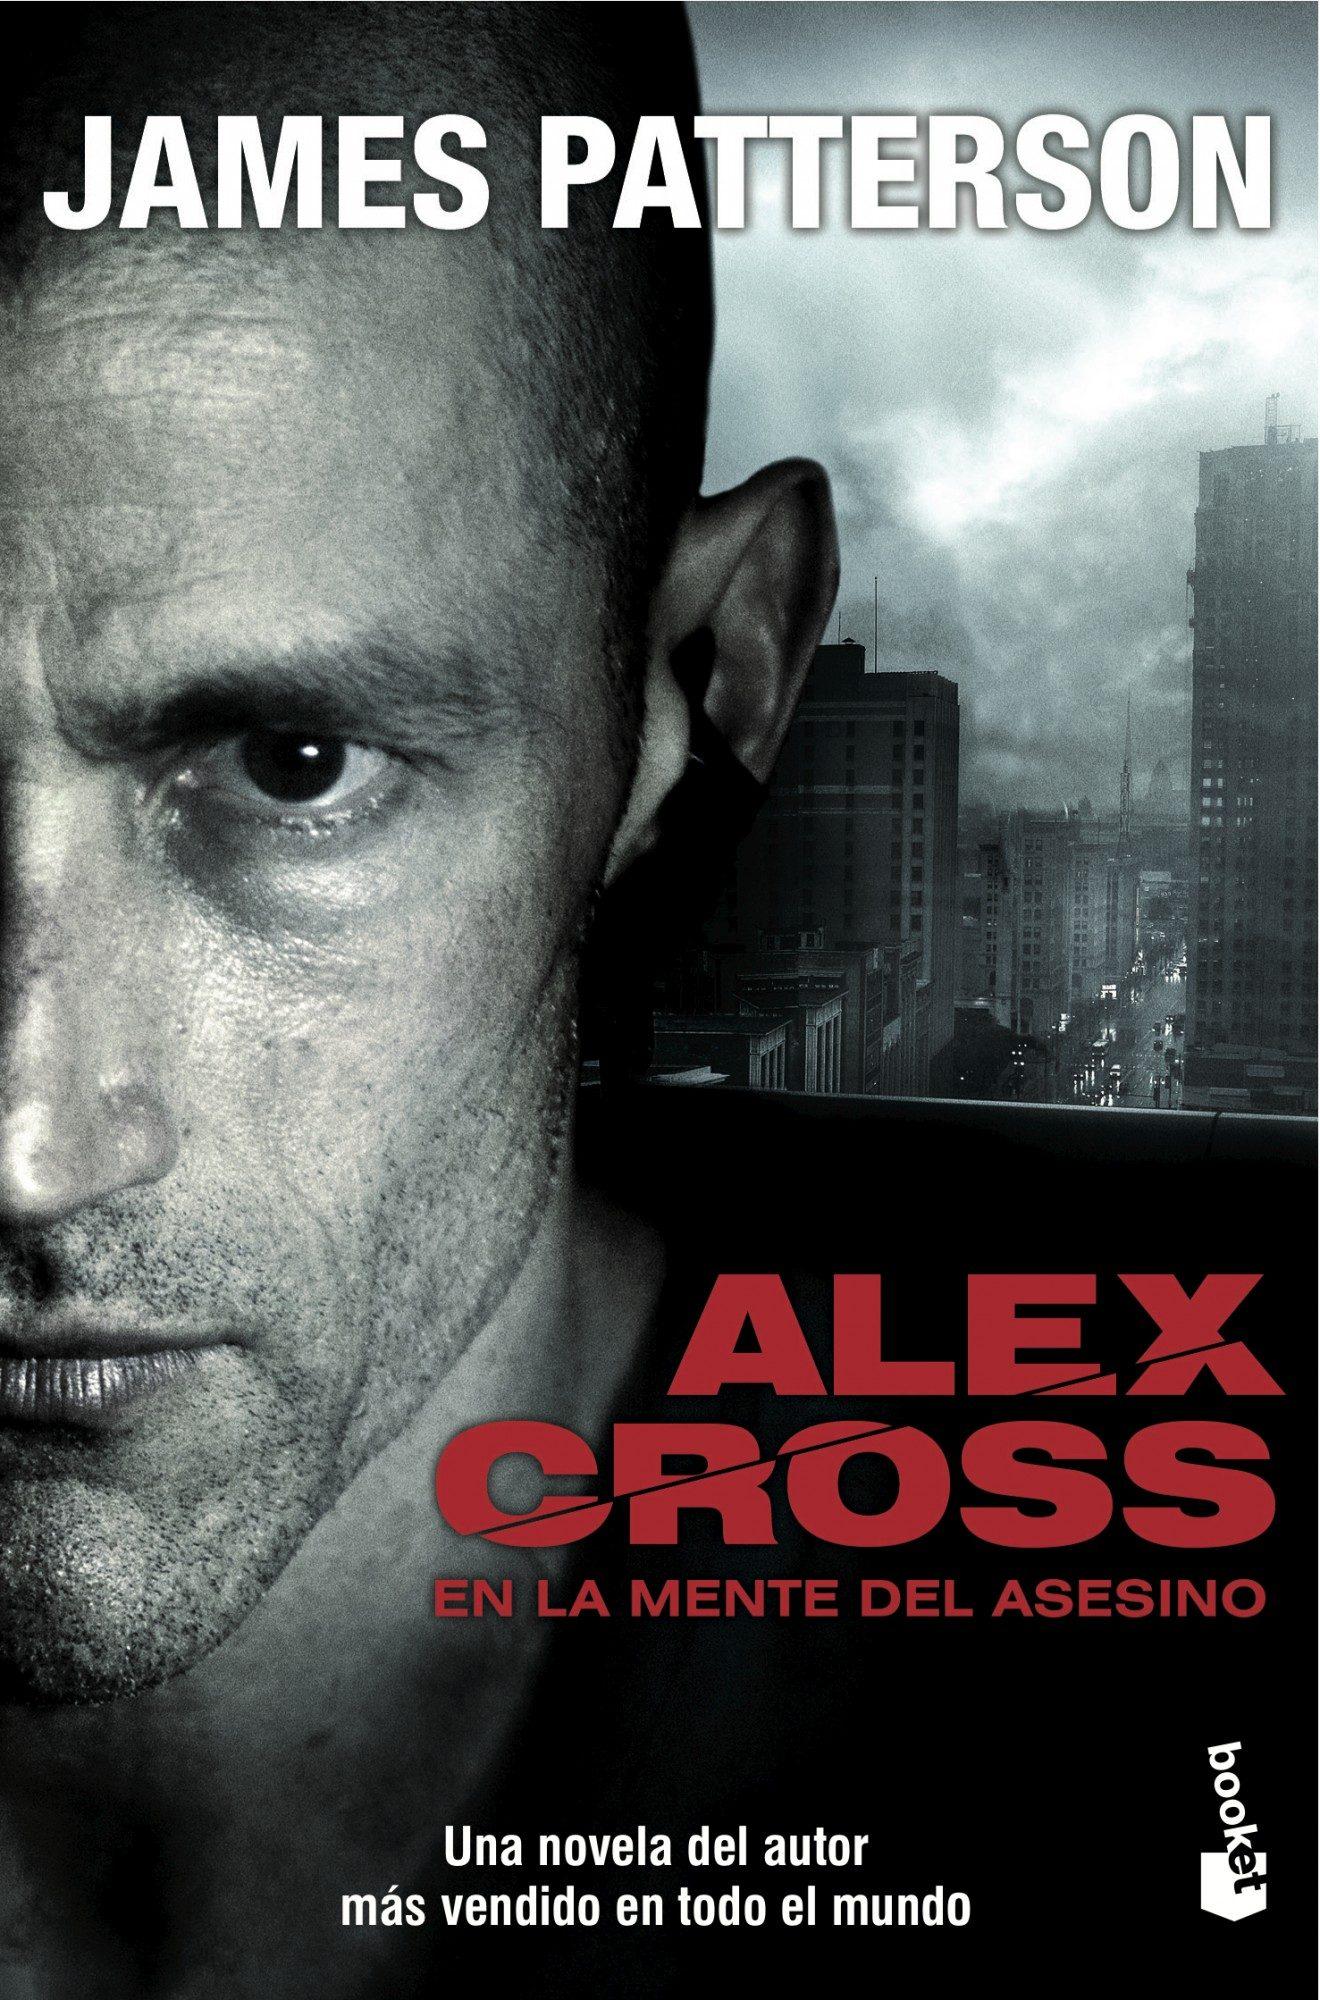 Alex Cross: En la Mente del Asesino - James Patterson - Booket